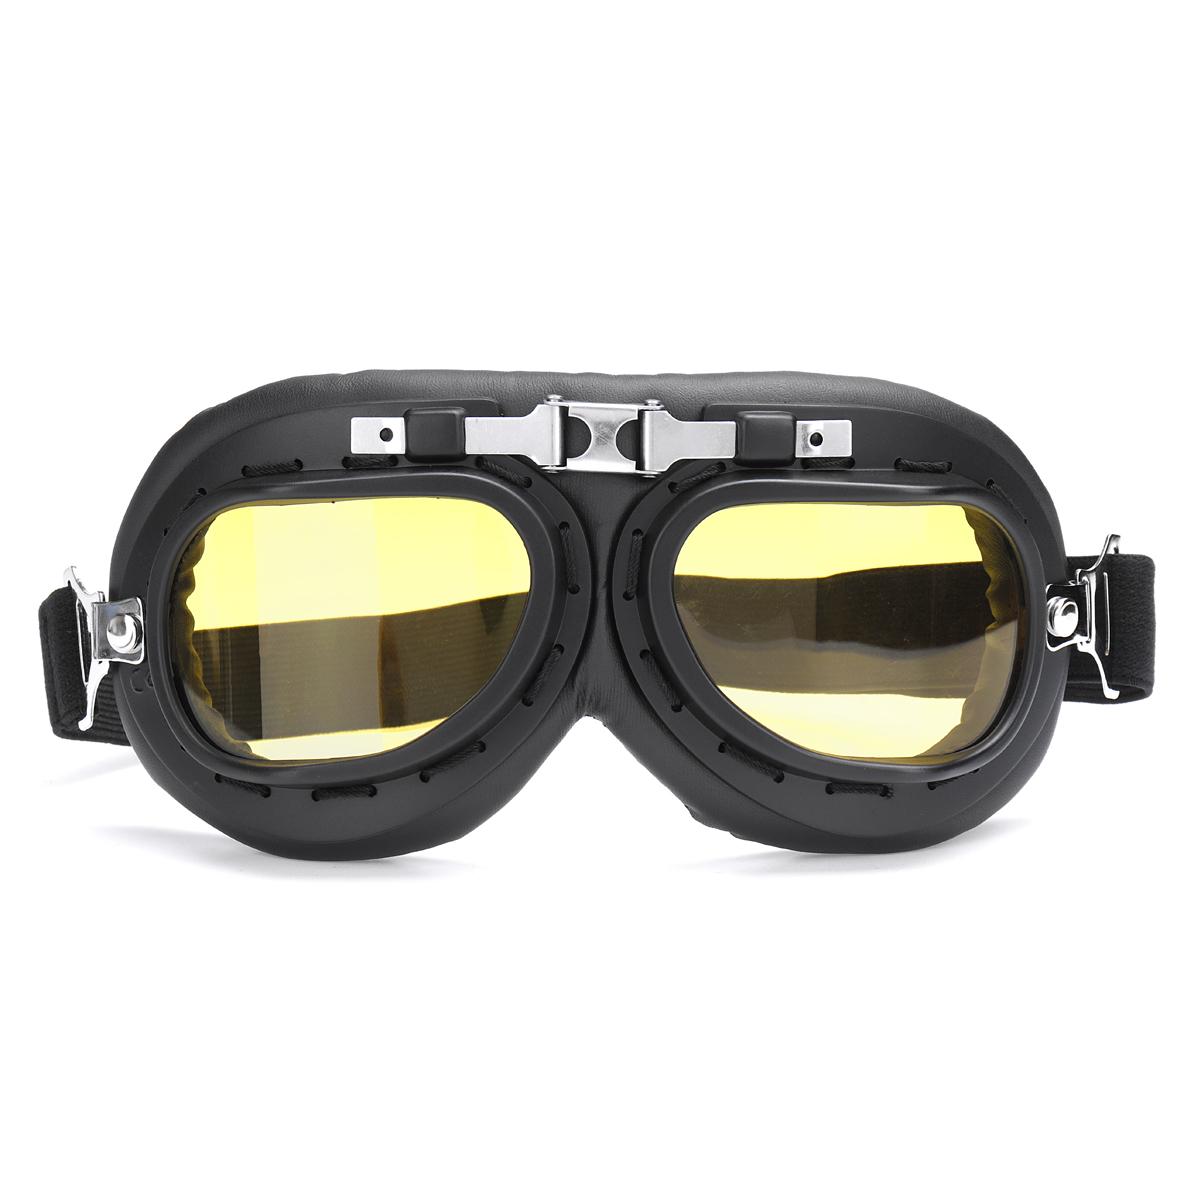 Windproof Retro Helmet Goggles Motorcycle Skiing Scooter ATV Flying Eyewear Glasses